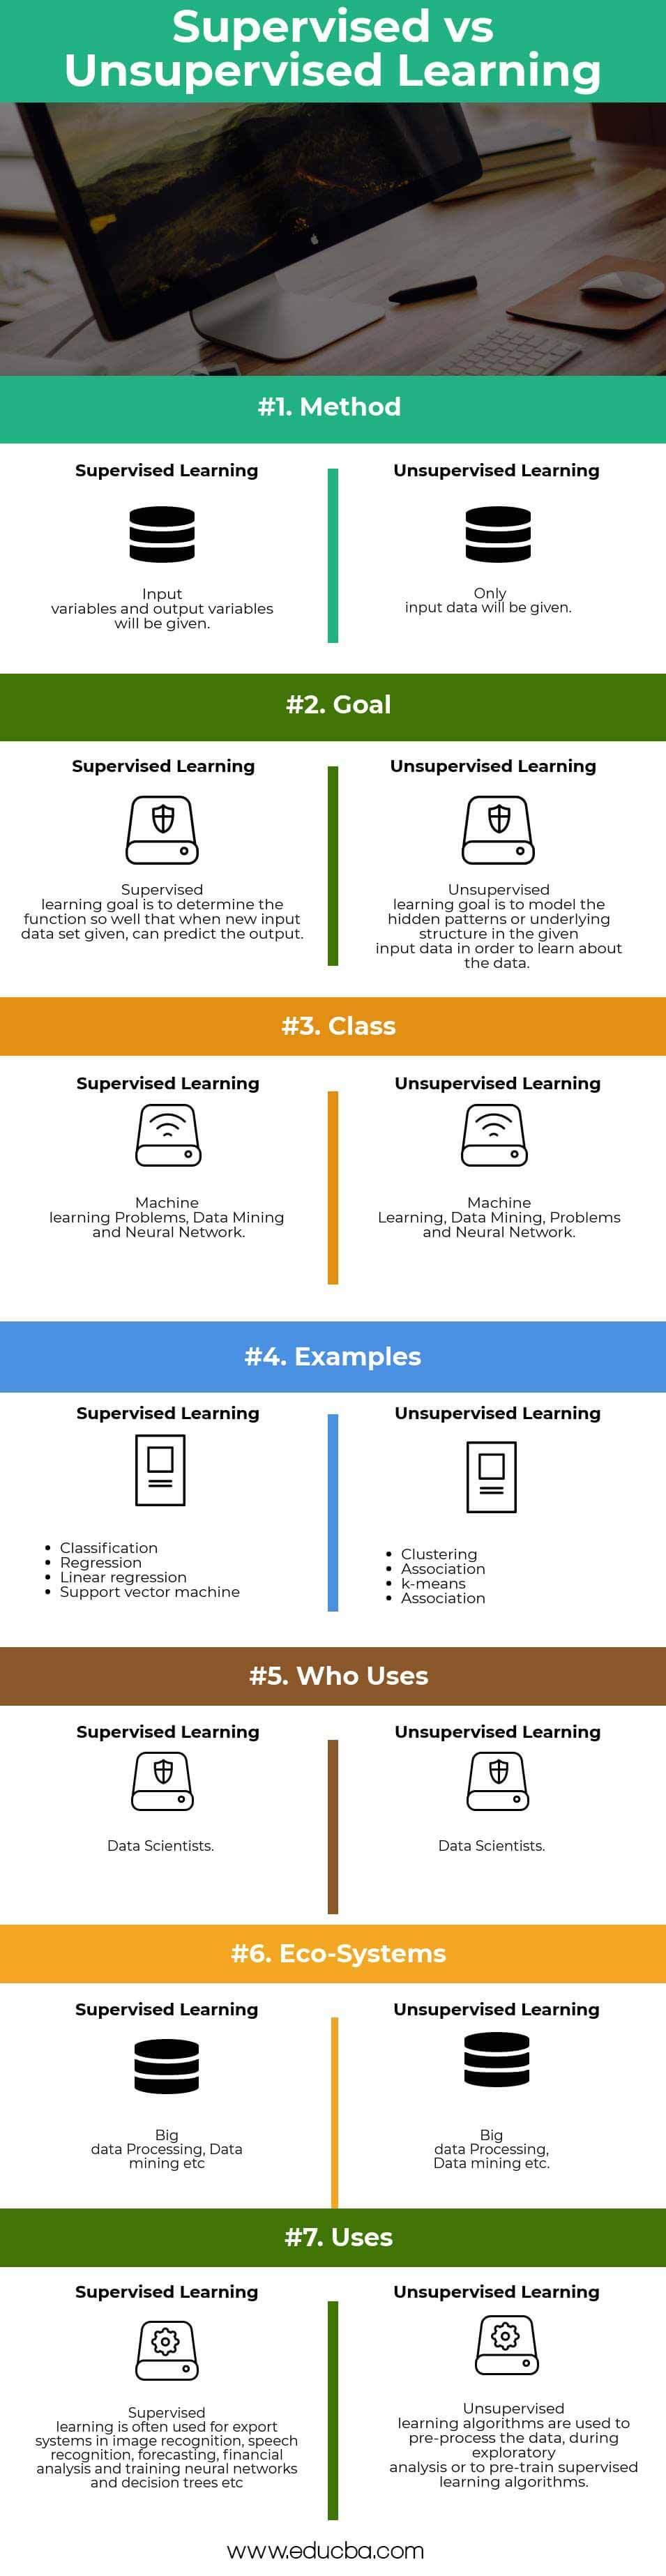 Supervised Learning vs Unsupervised Learning - Best 7 Useful